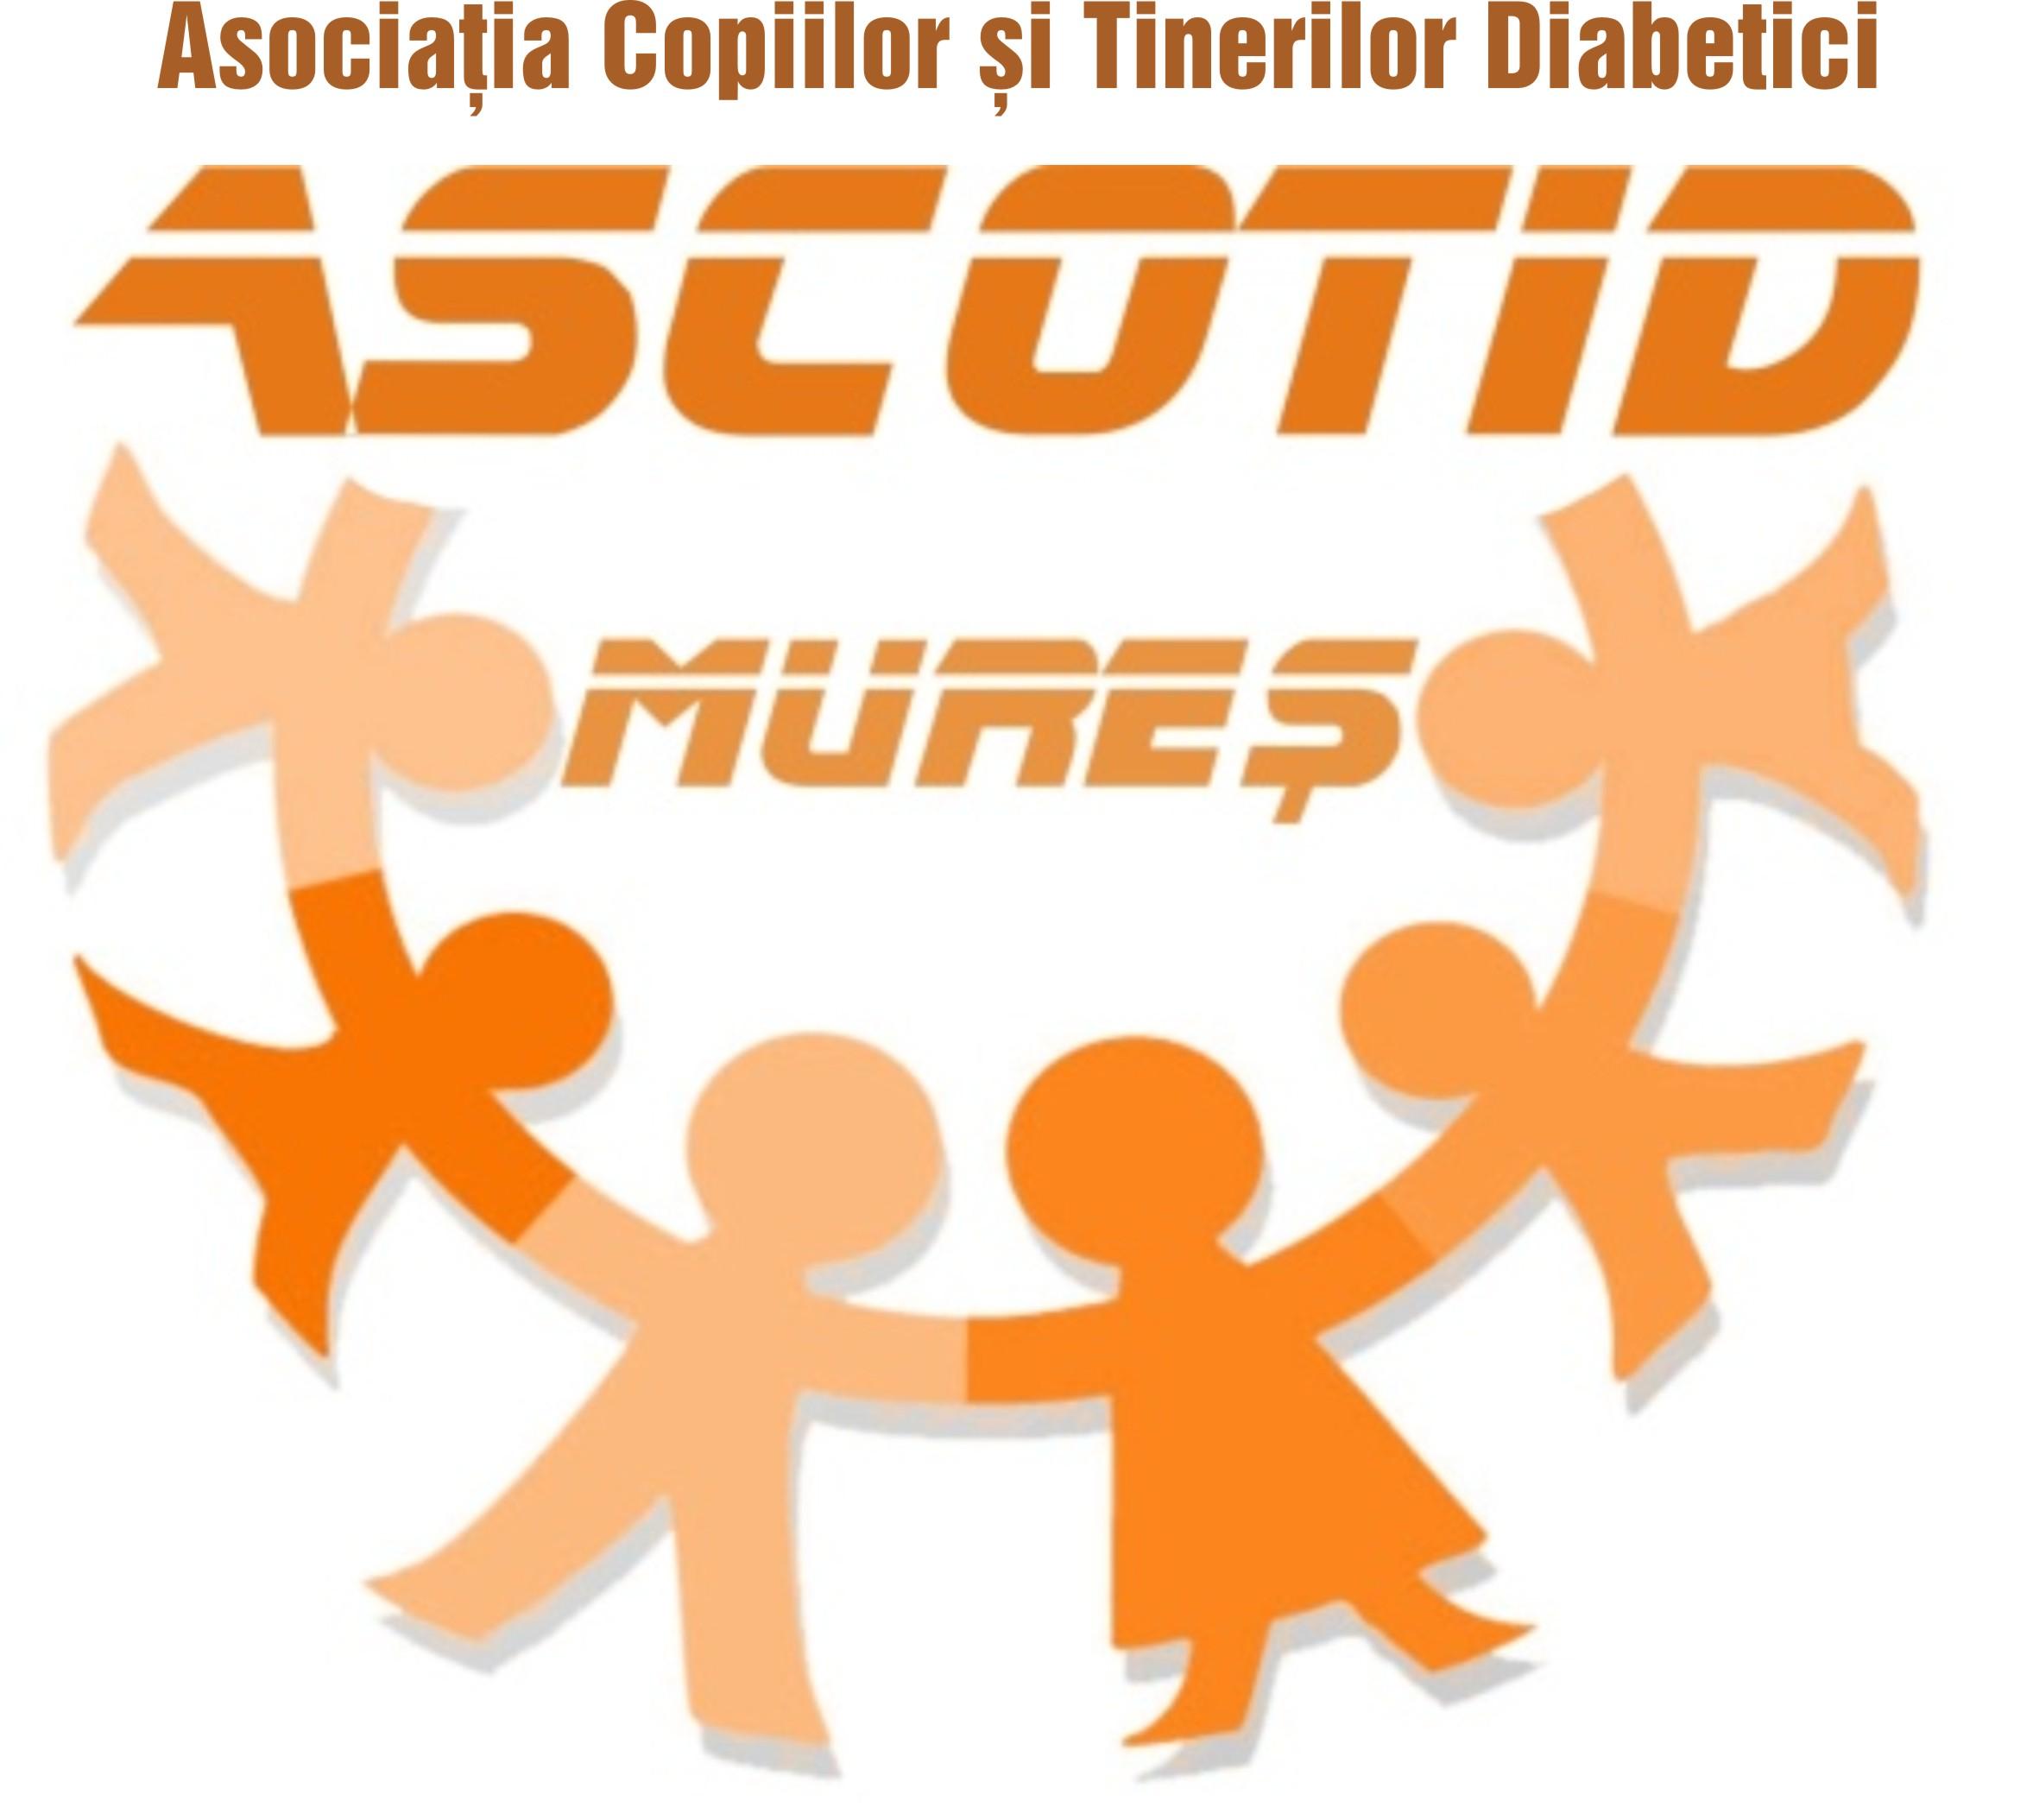 Asociatia Copiilor si Tinerilor Diabetici Mures (ASCOTID) logo